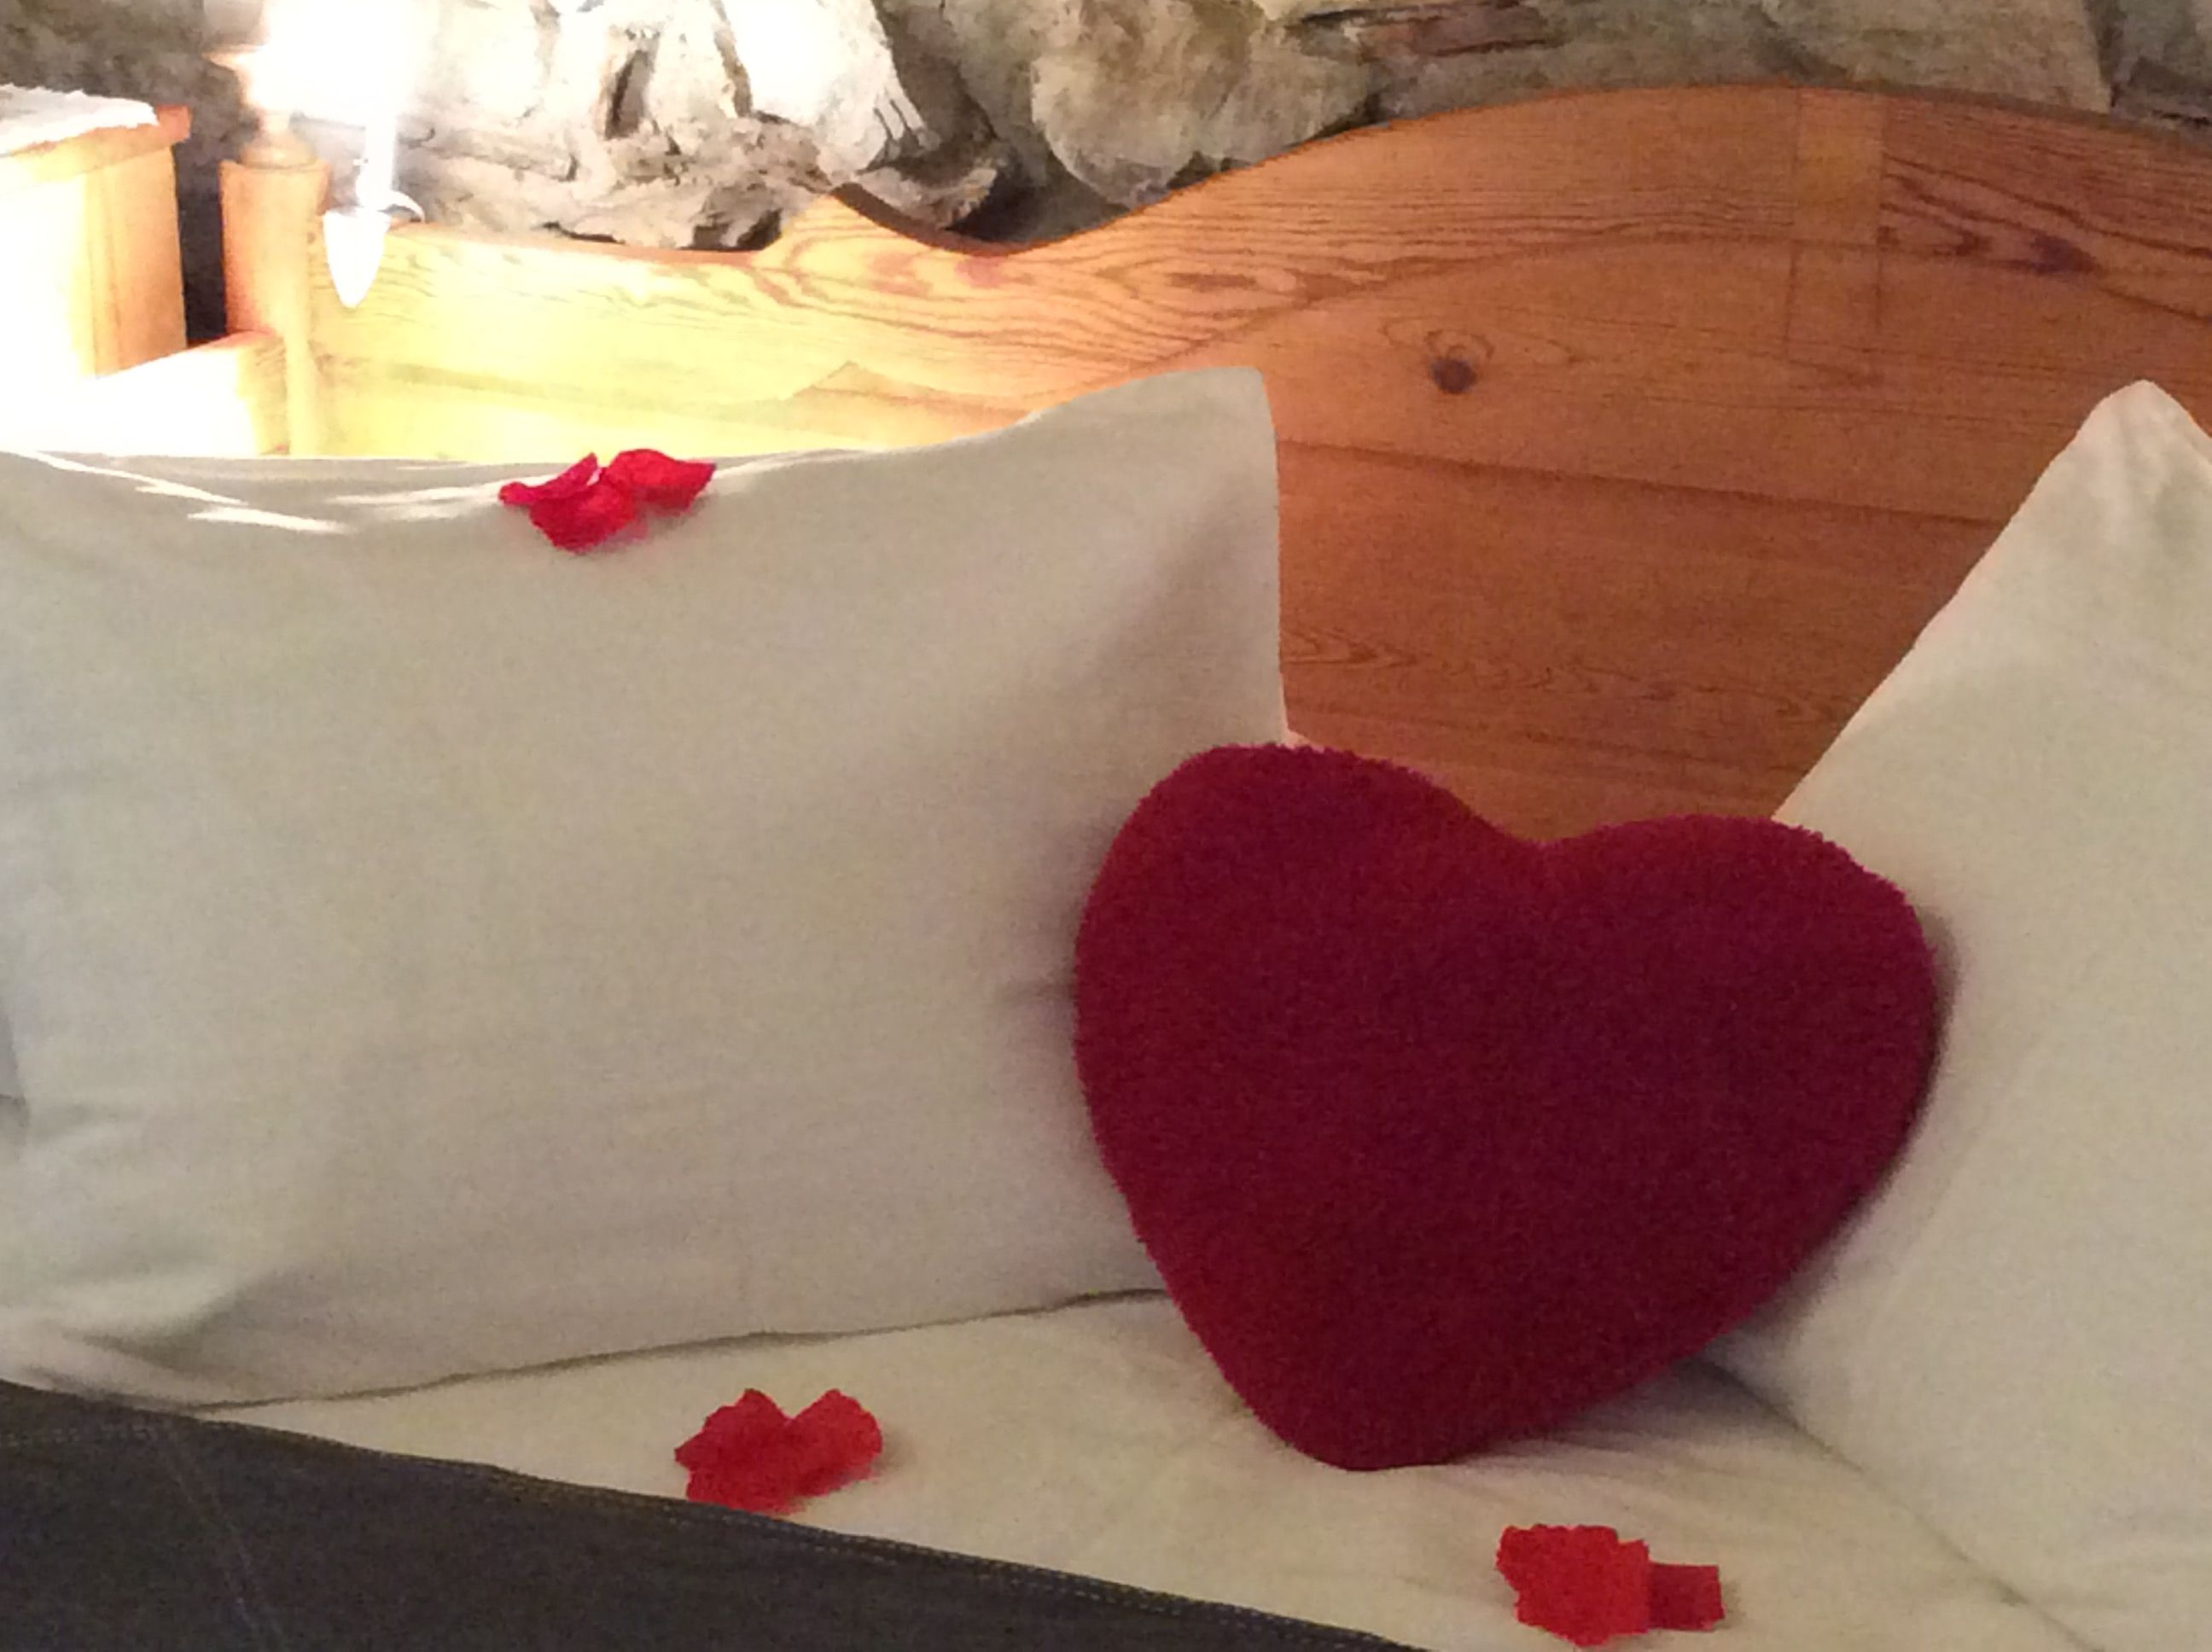 #bidart #enmodebasque #hotel #bassilour #biarritzpaysbasque #domainedebassilour #saintvalentin #loveisintheair #amour #romantique #romantisme #hotelbidart #weekend #vacances #love